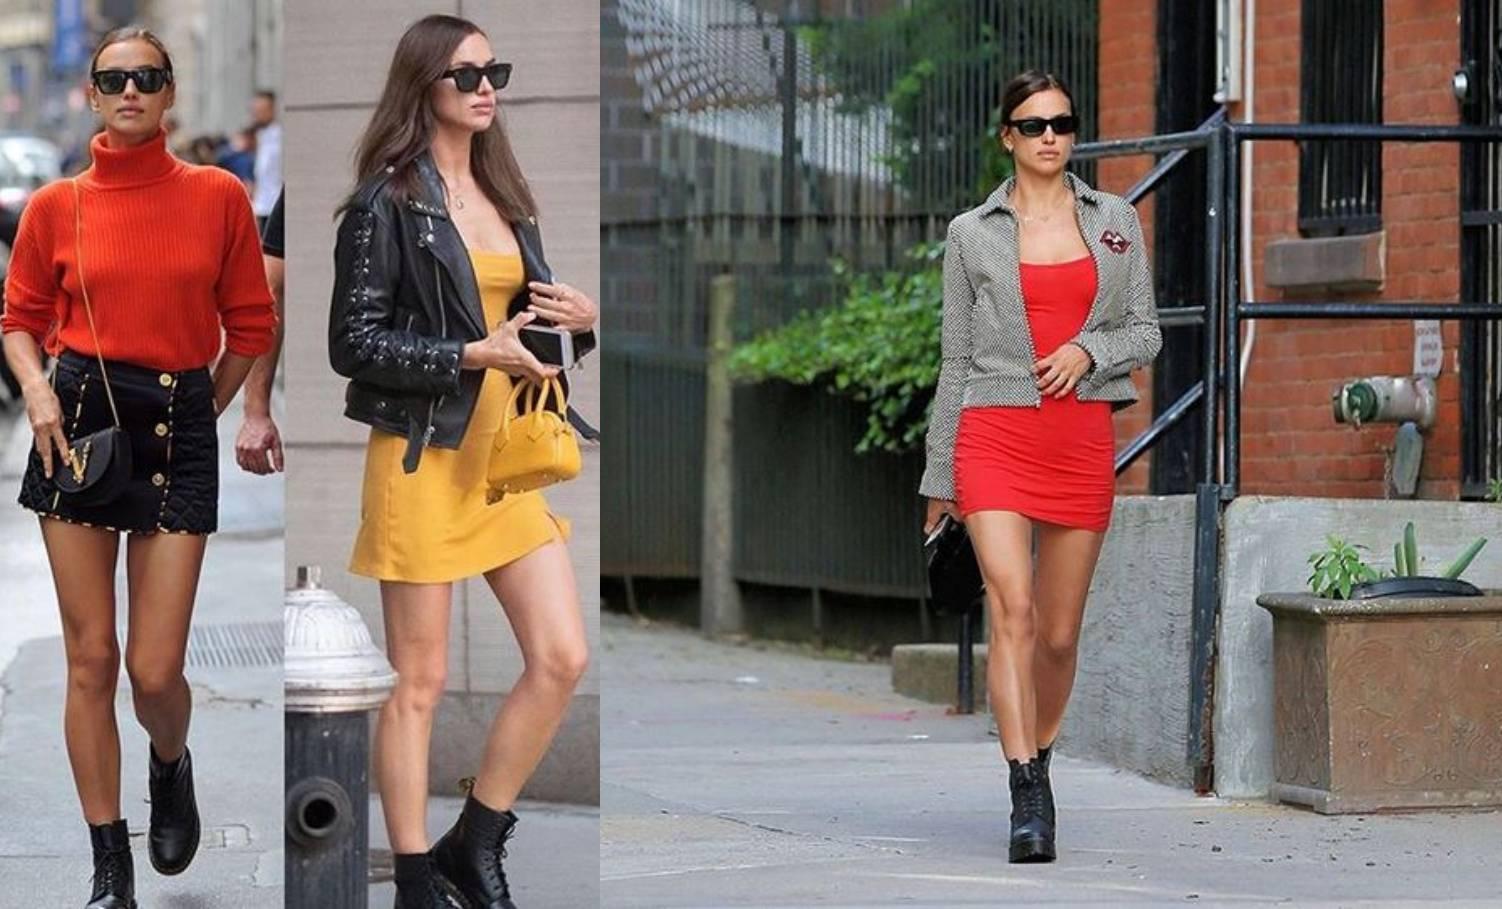 Lijepa Irina Shayk ima favorit kombinaciju: Minica plus Marte